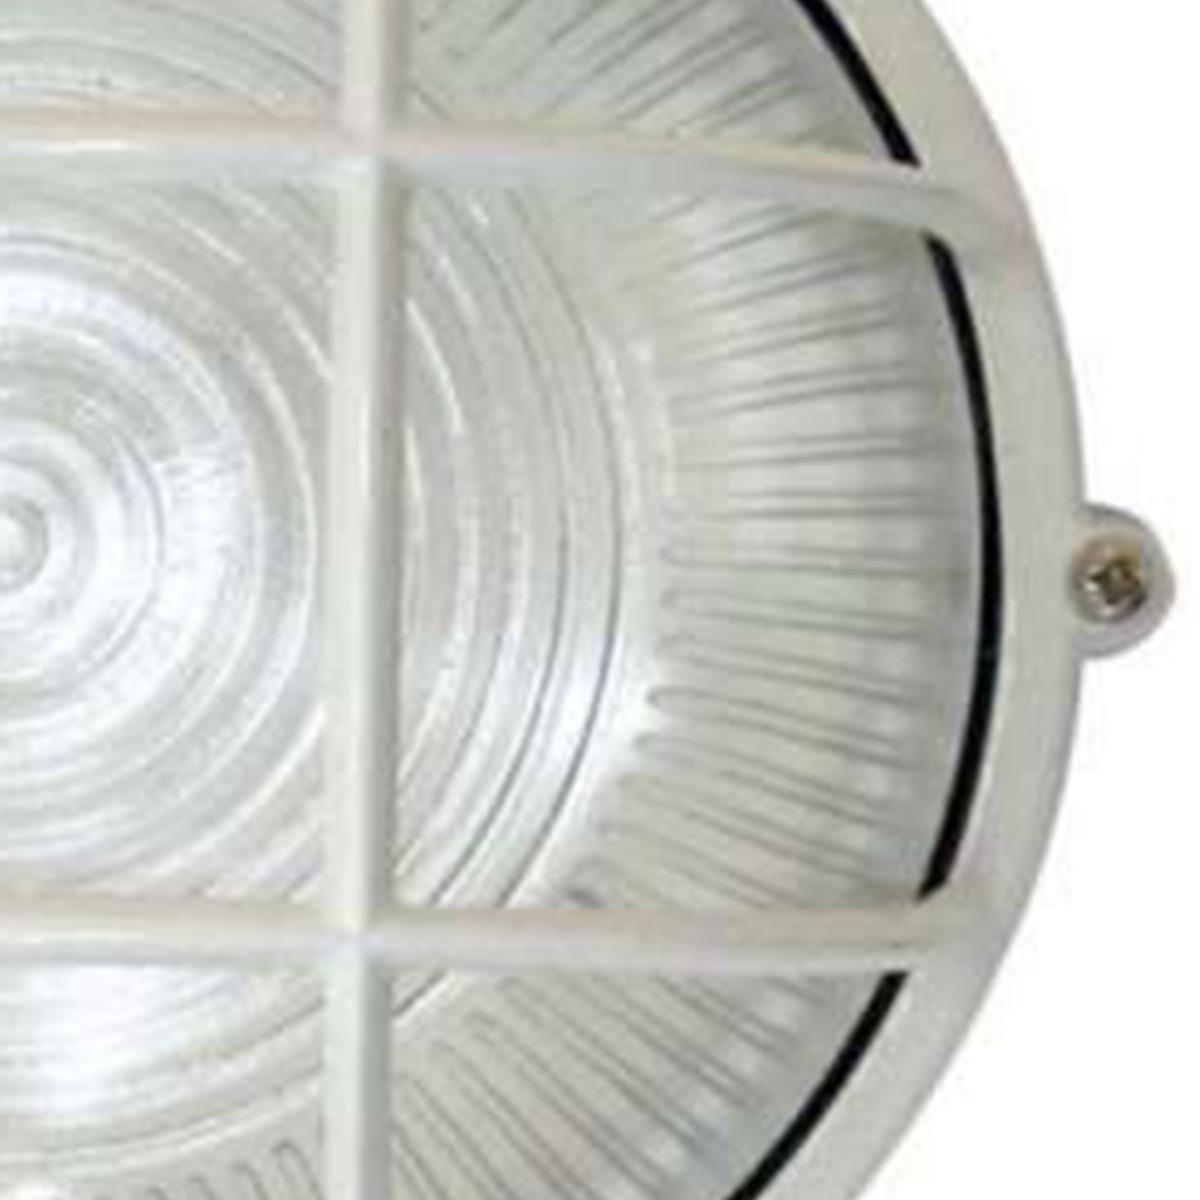 Tartaruga Circular 18cm Aluminio Pint. Epoxi E-27 1 Lamp. Max 60w C/ Grade Branca